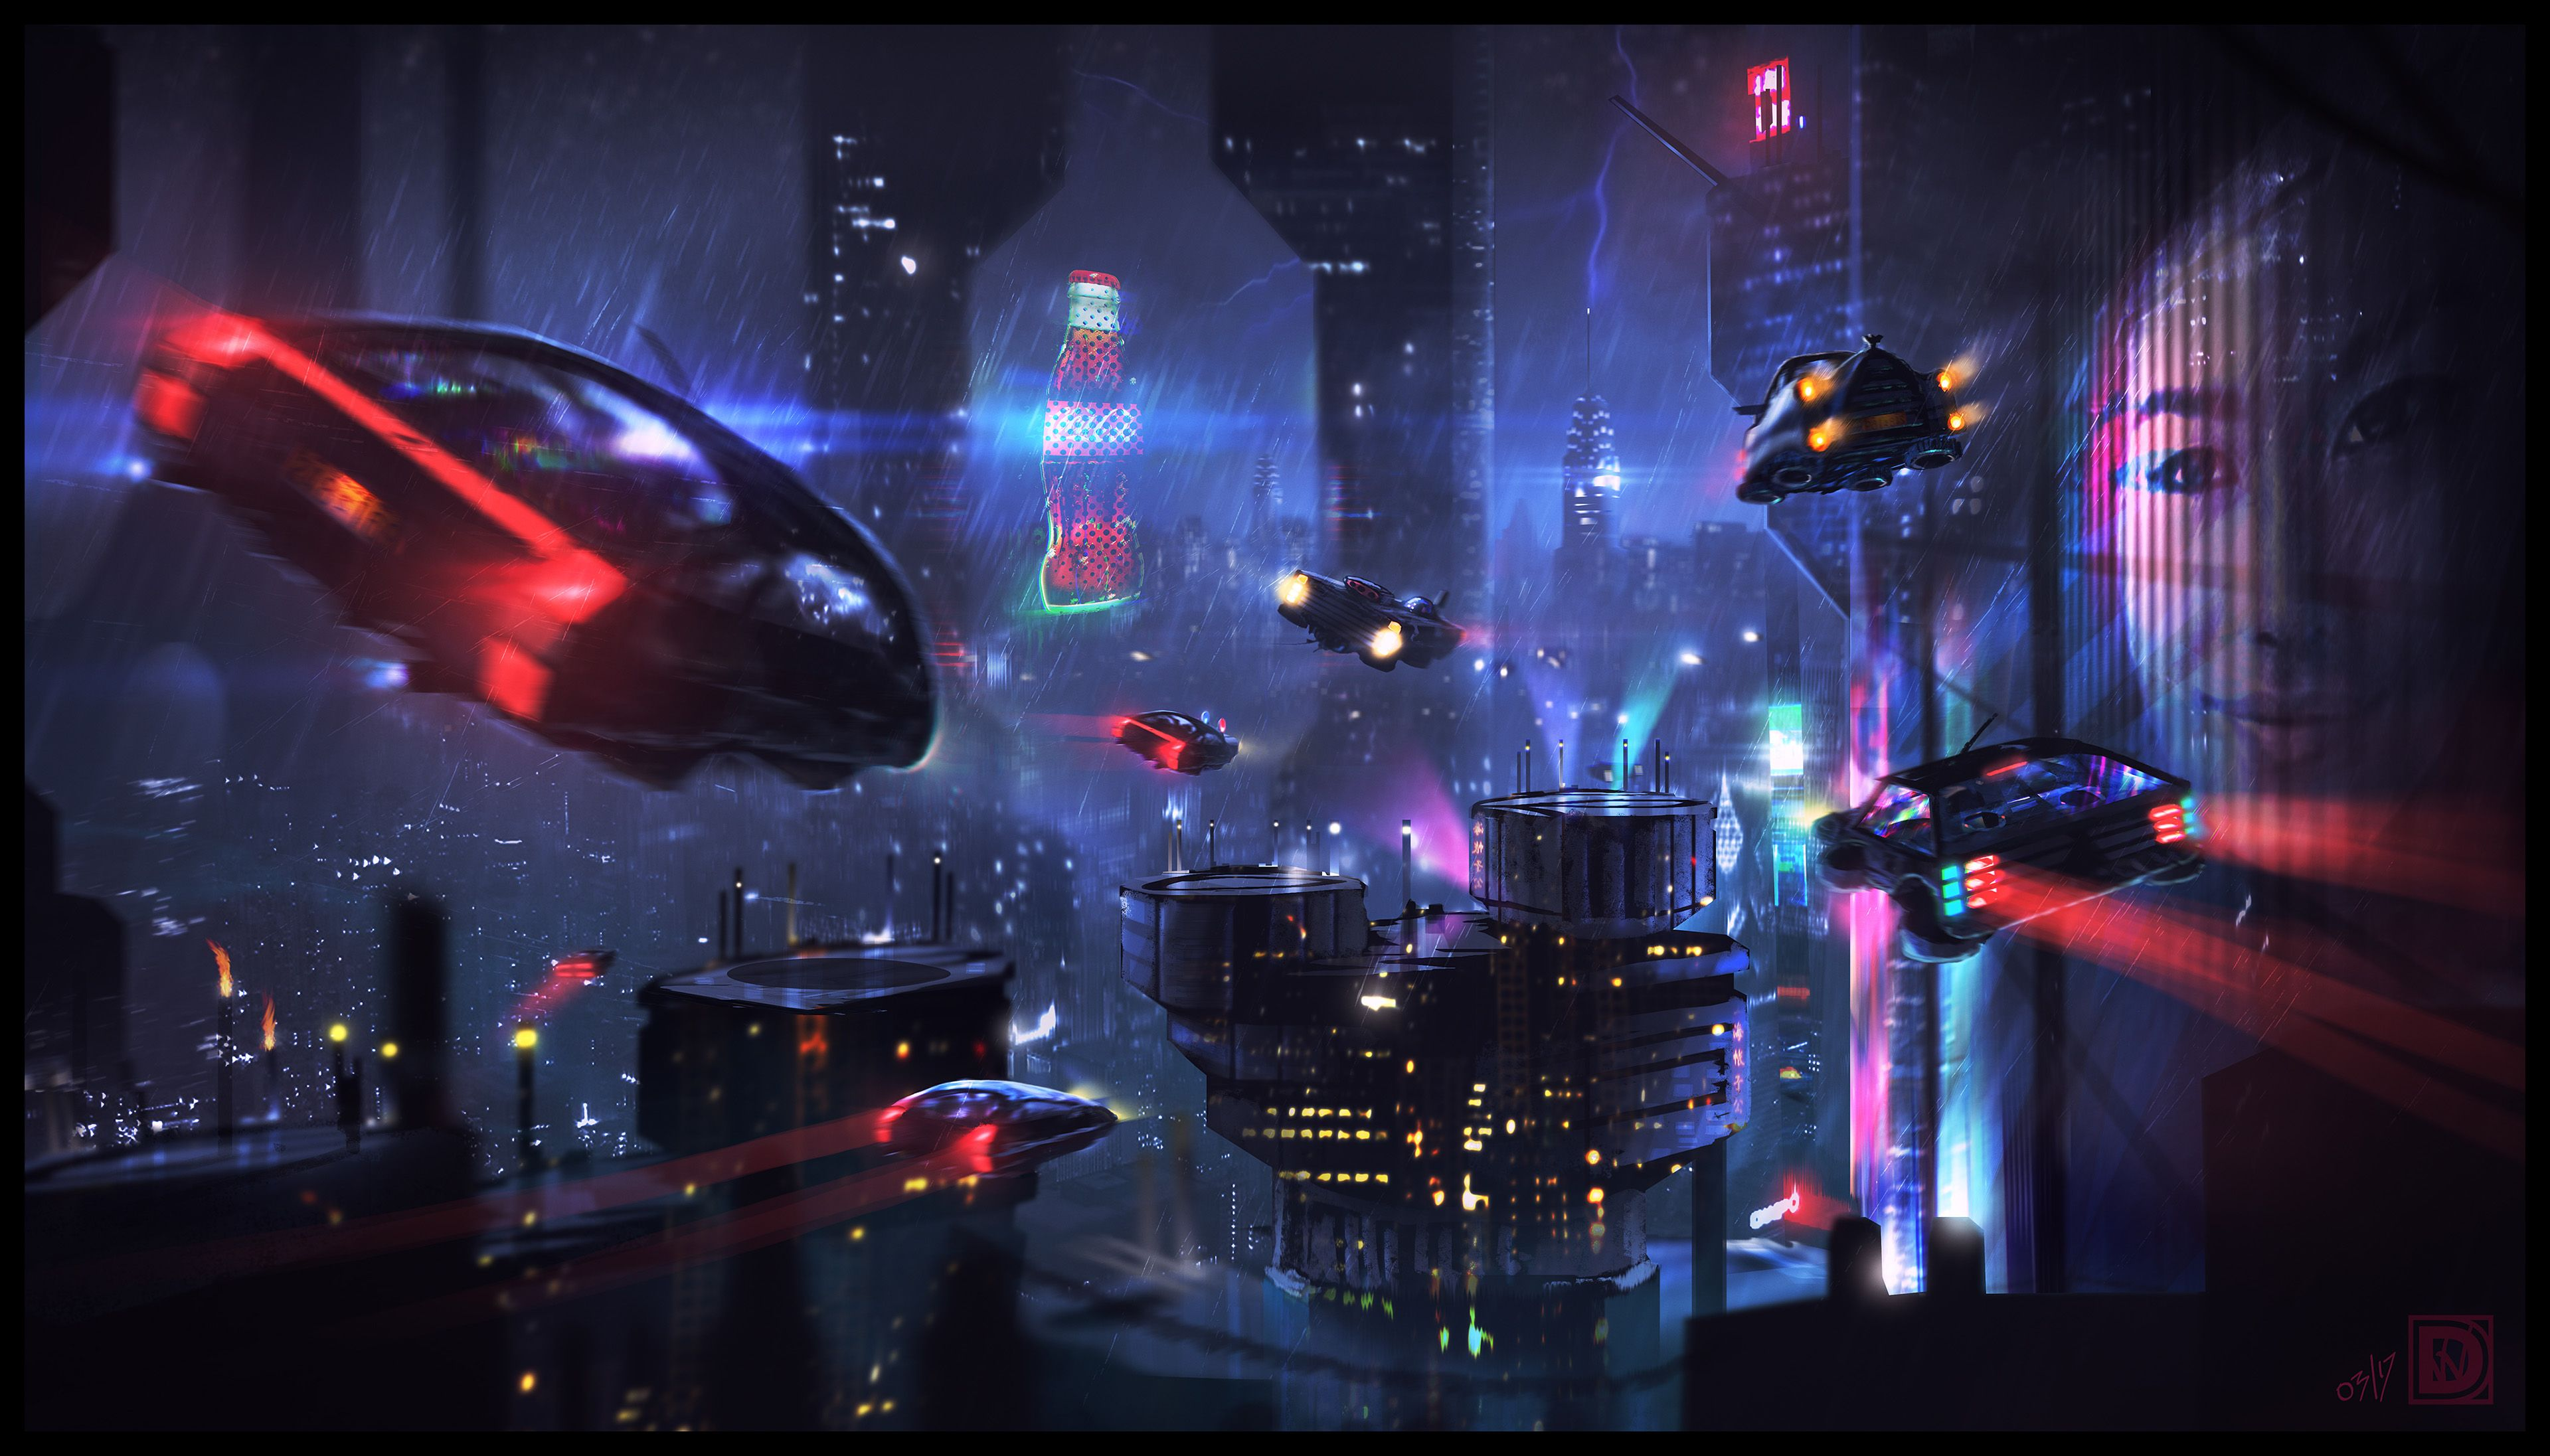 Blade Runner Hd Wallpapers Top Free Blade Runner Hd Backgrounds